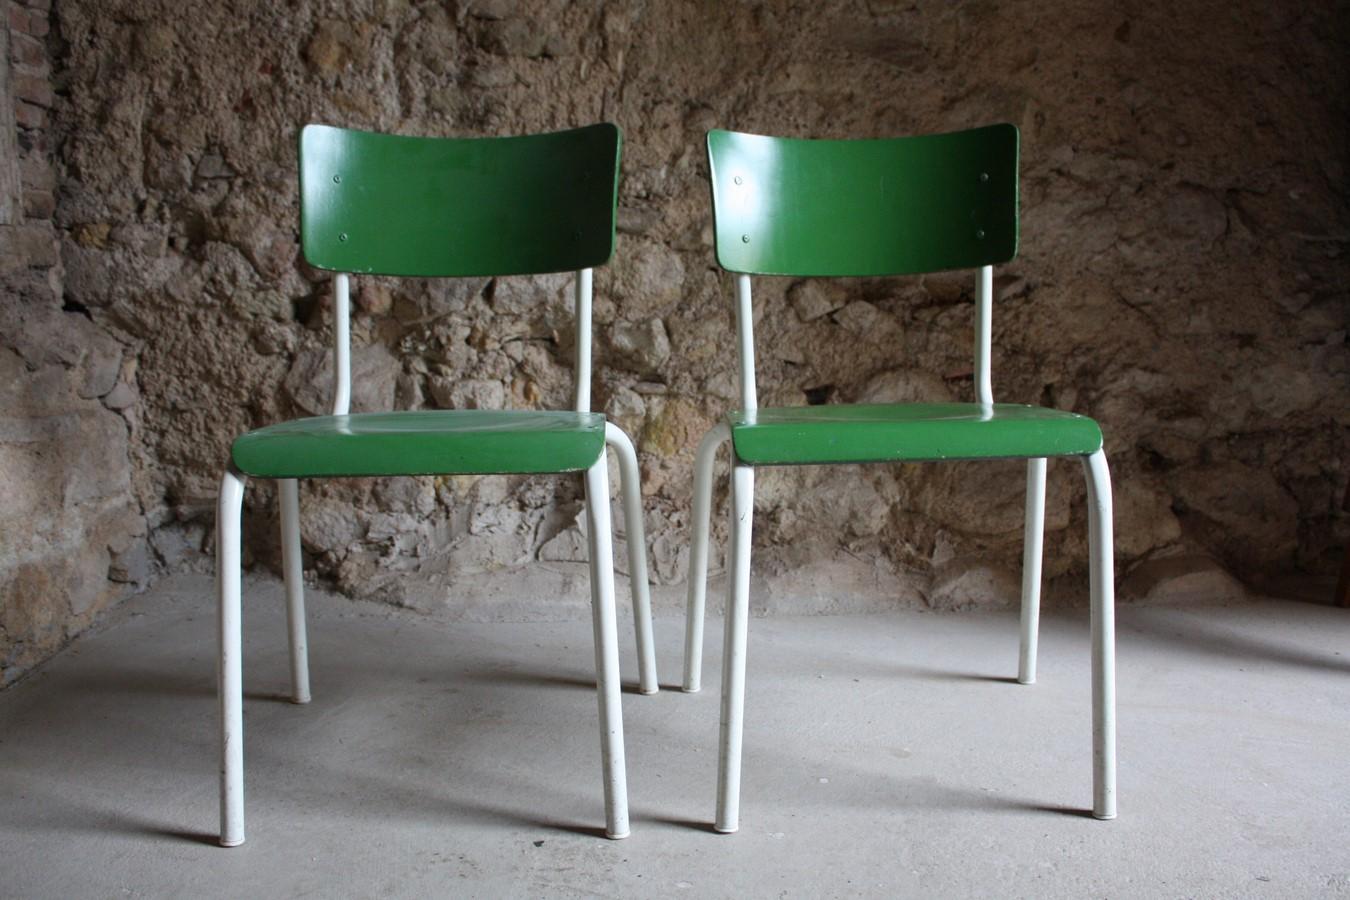 gebrauchte-stuhle-kantine-vintage-midcentury-modern-loft-antik-2